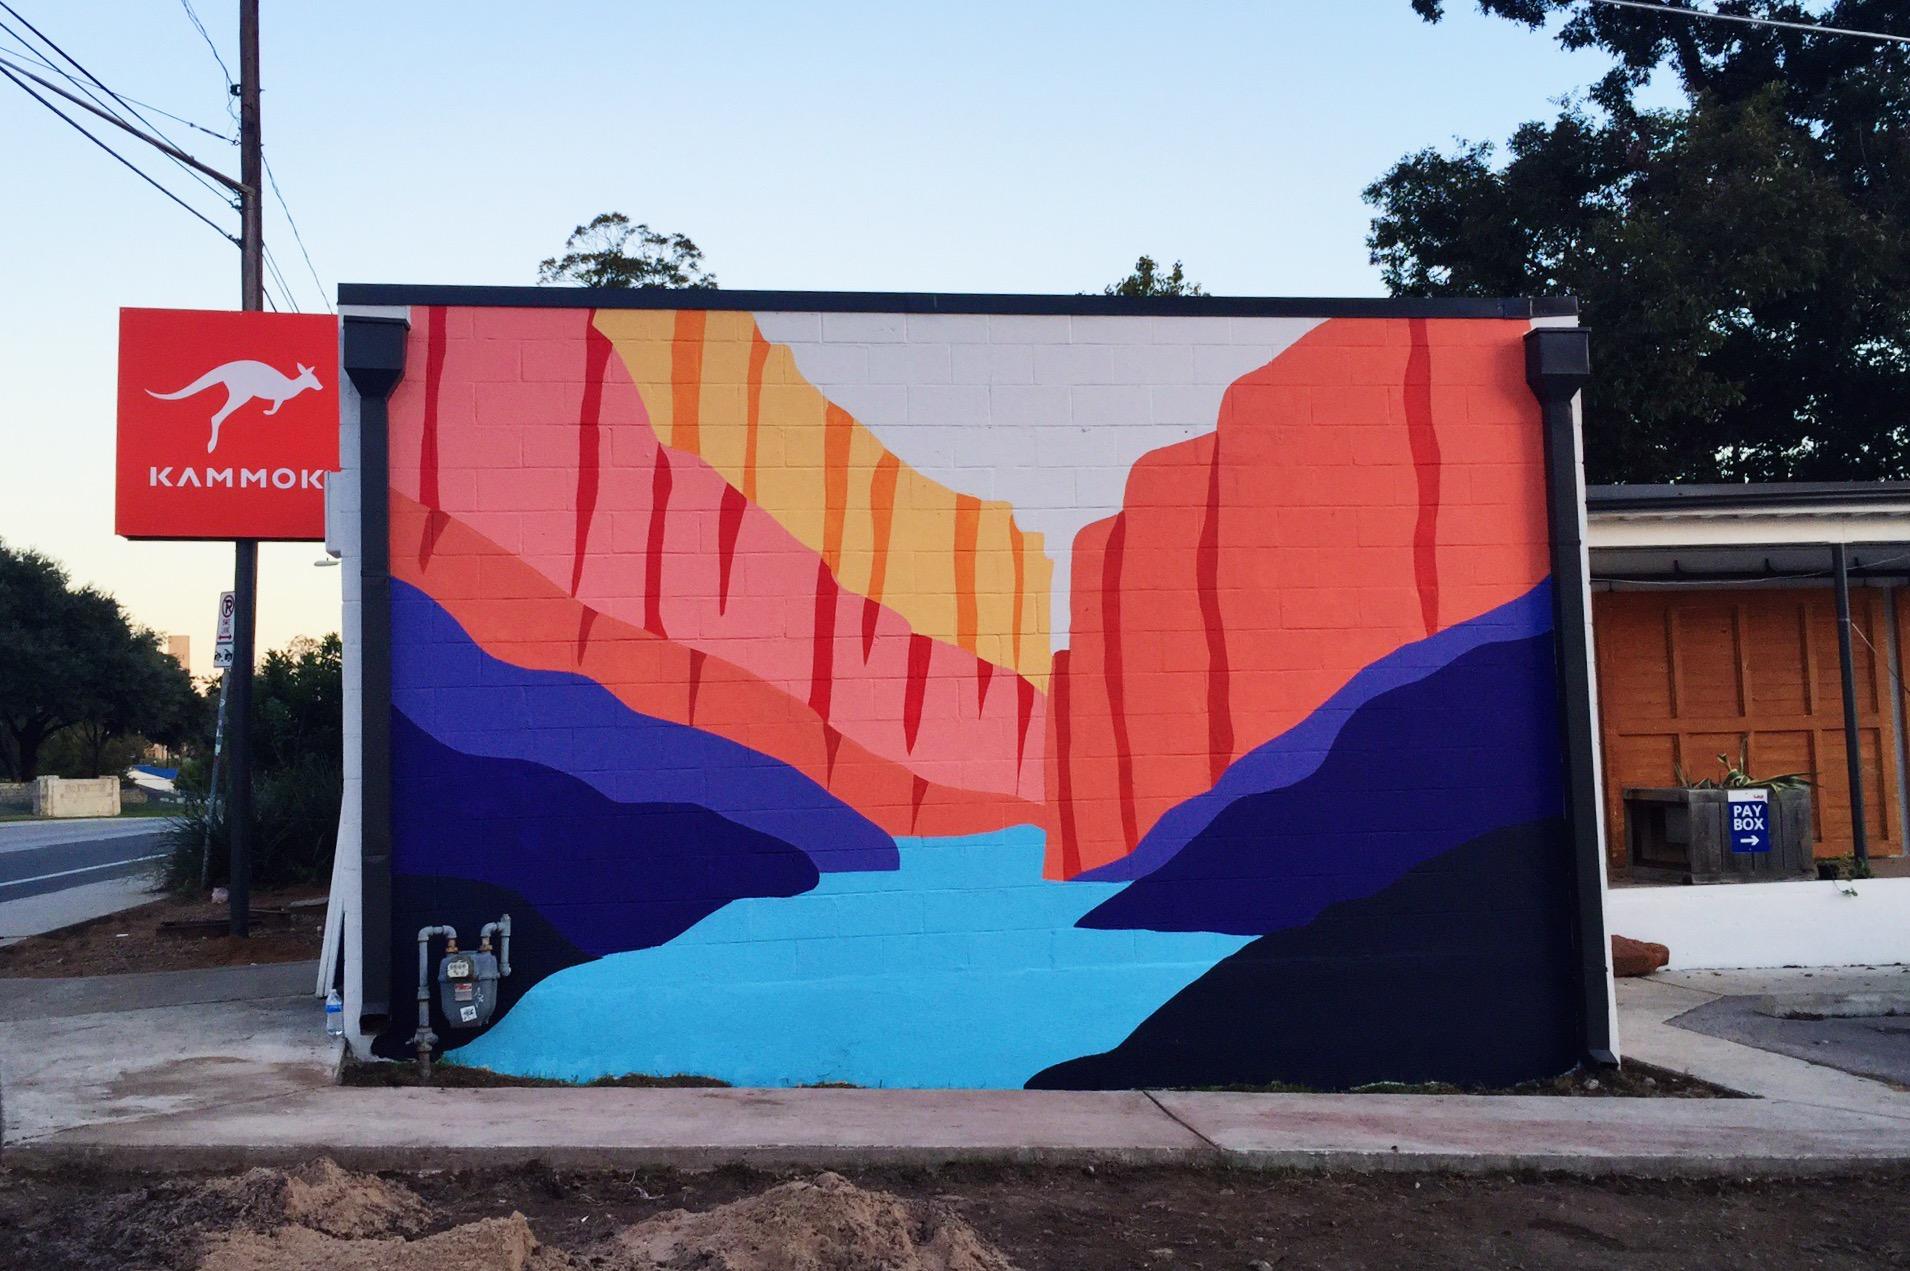 Austin Kammok Mural